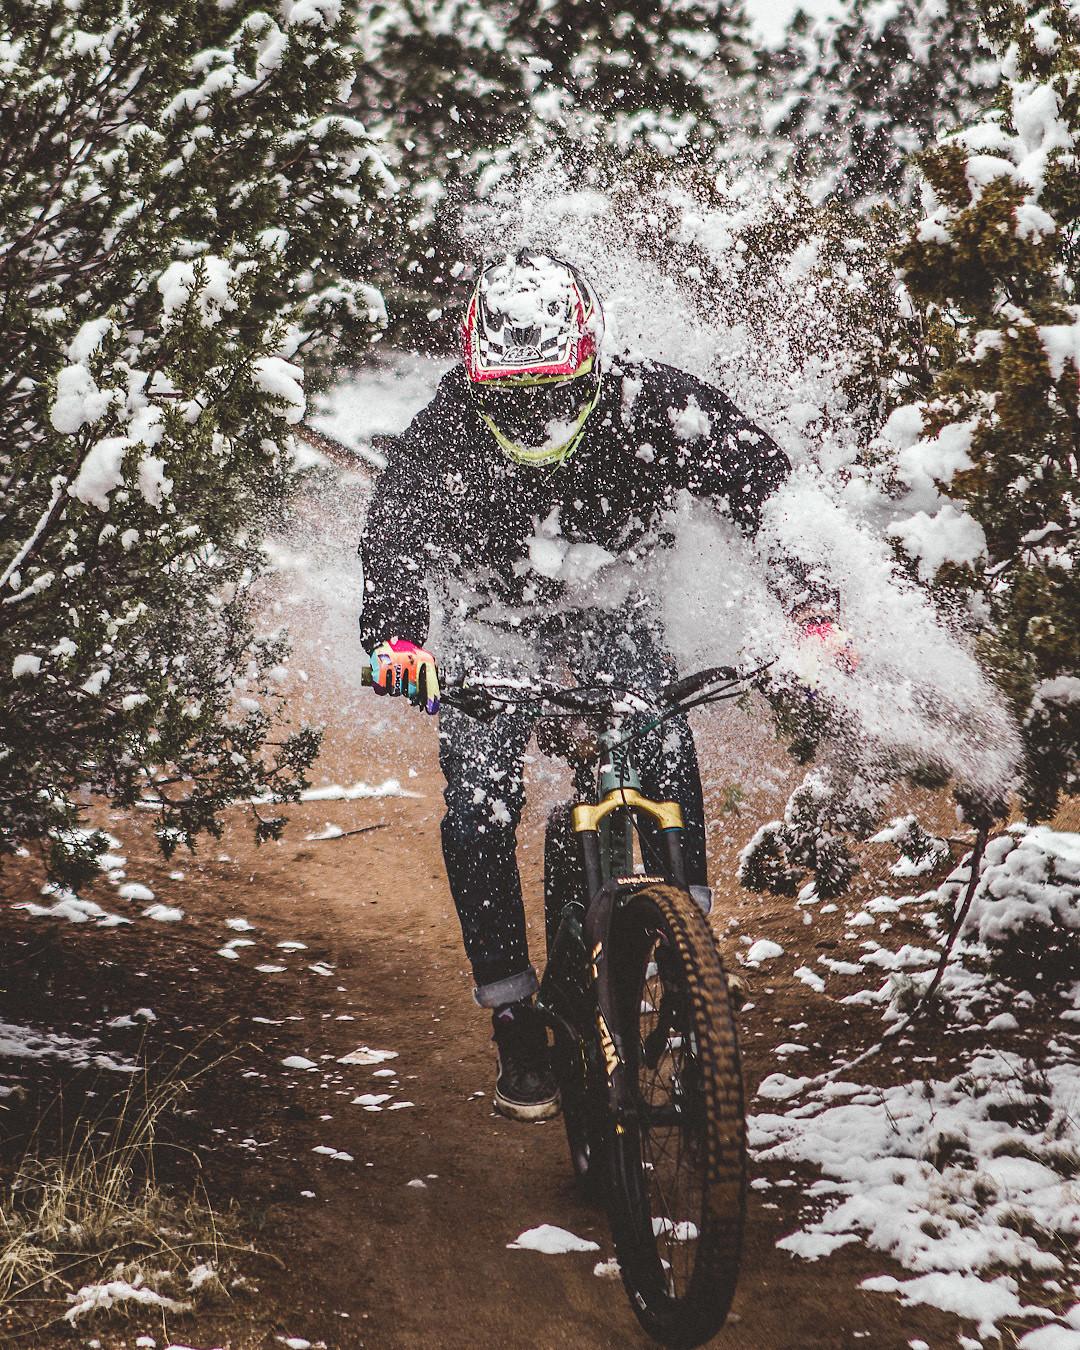 HandskeSnow - Dogspeedmtb - Mountain Biking Pictures - Vital MTB